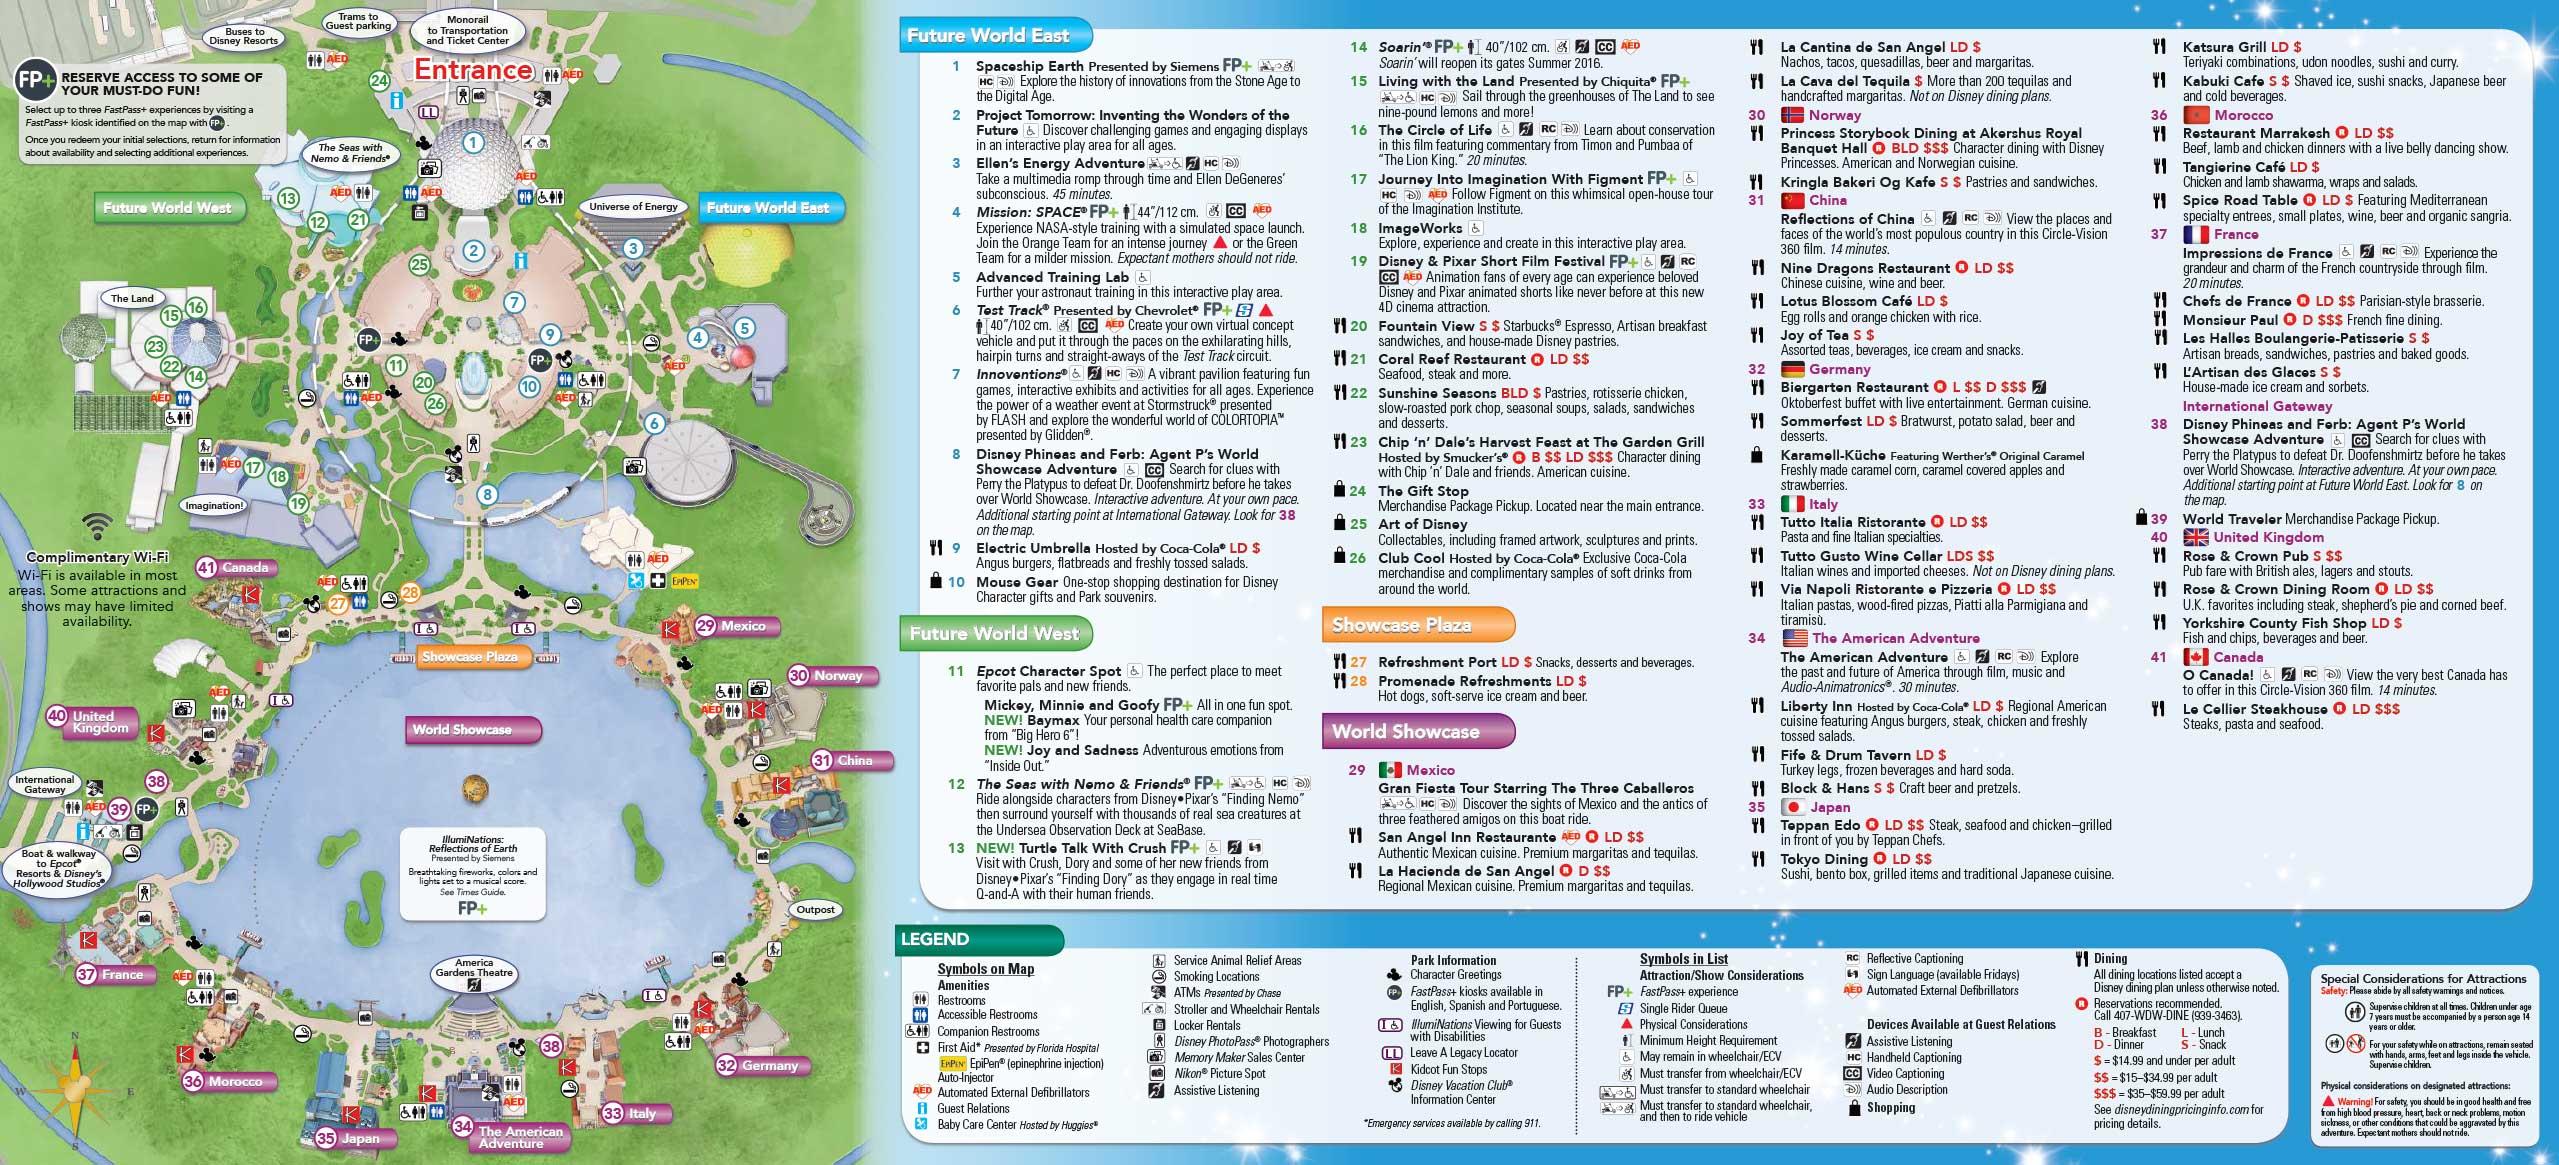 May 2016 Walt Disney World Park Maps